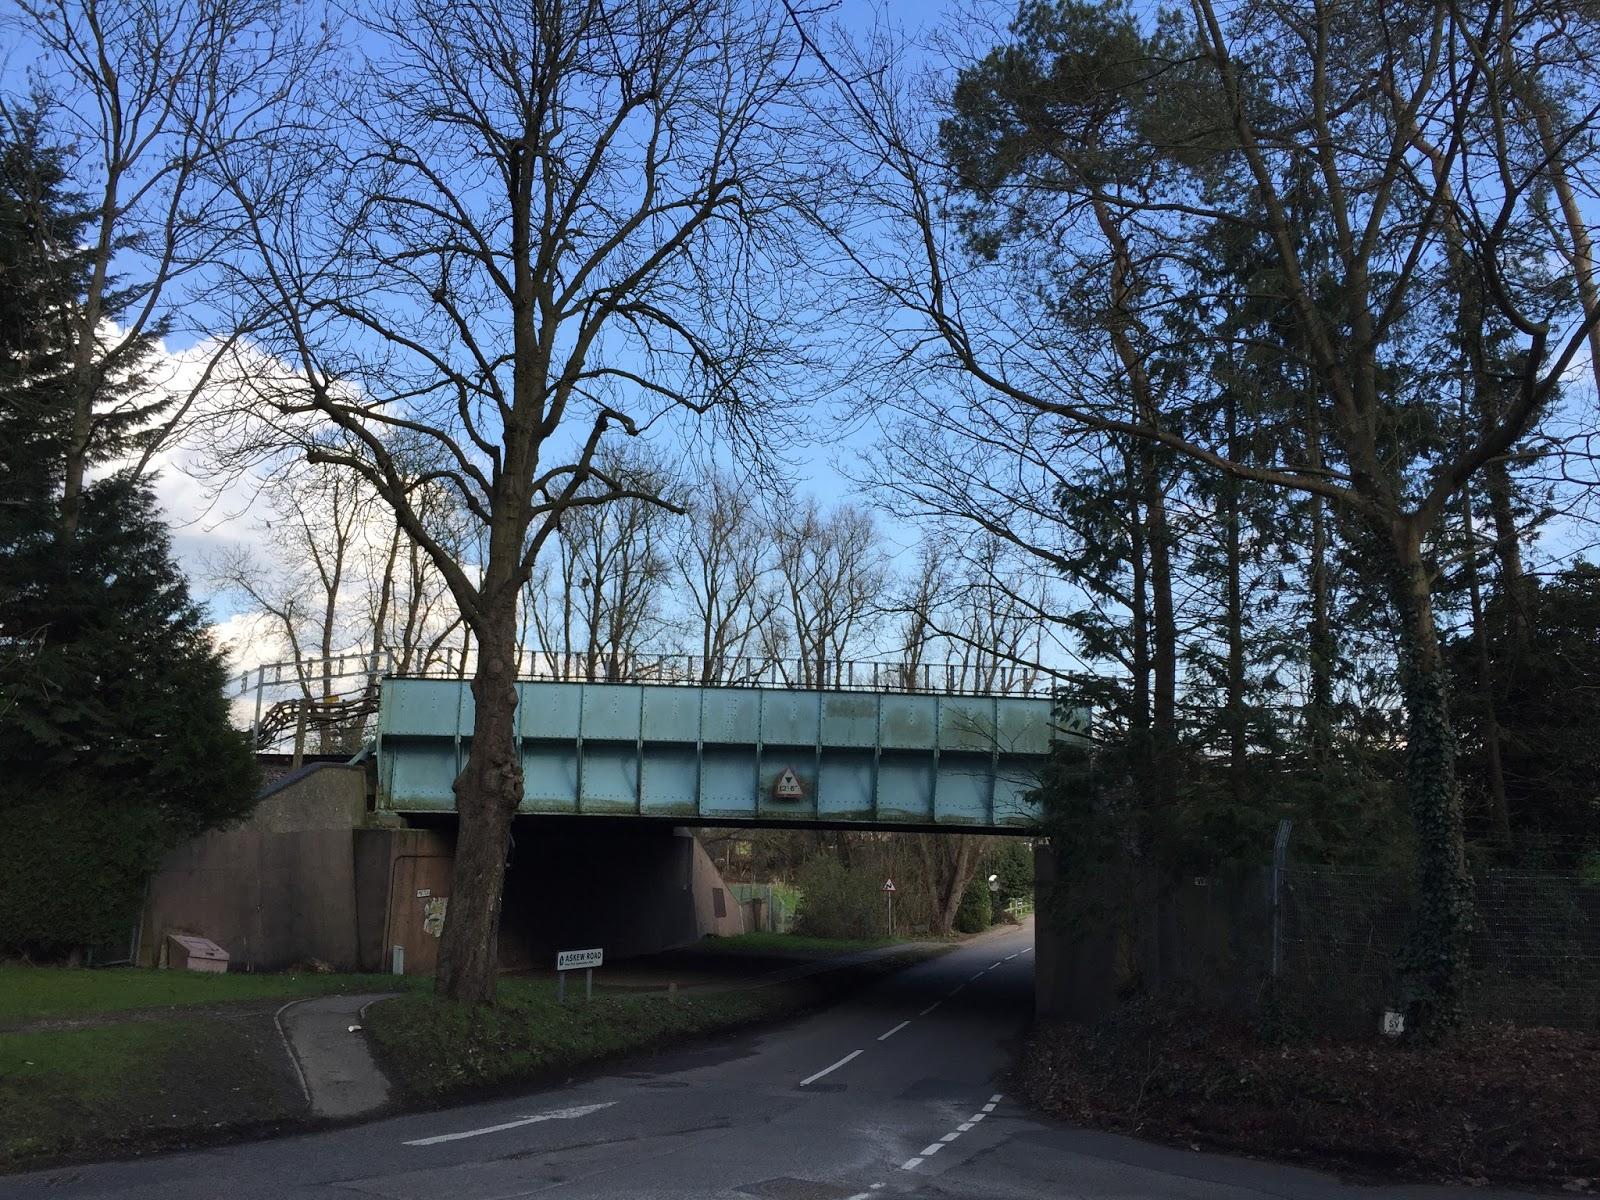 Bridge carrying the Metropolitan line north from Moor Park